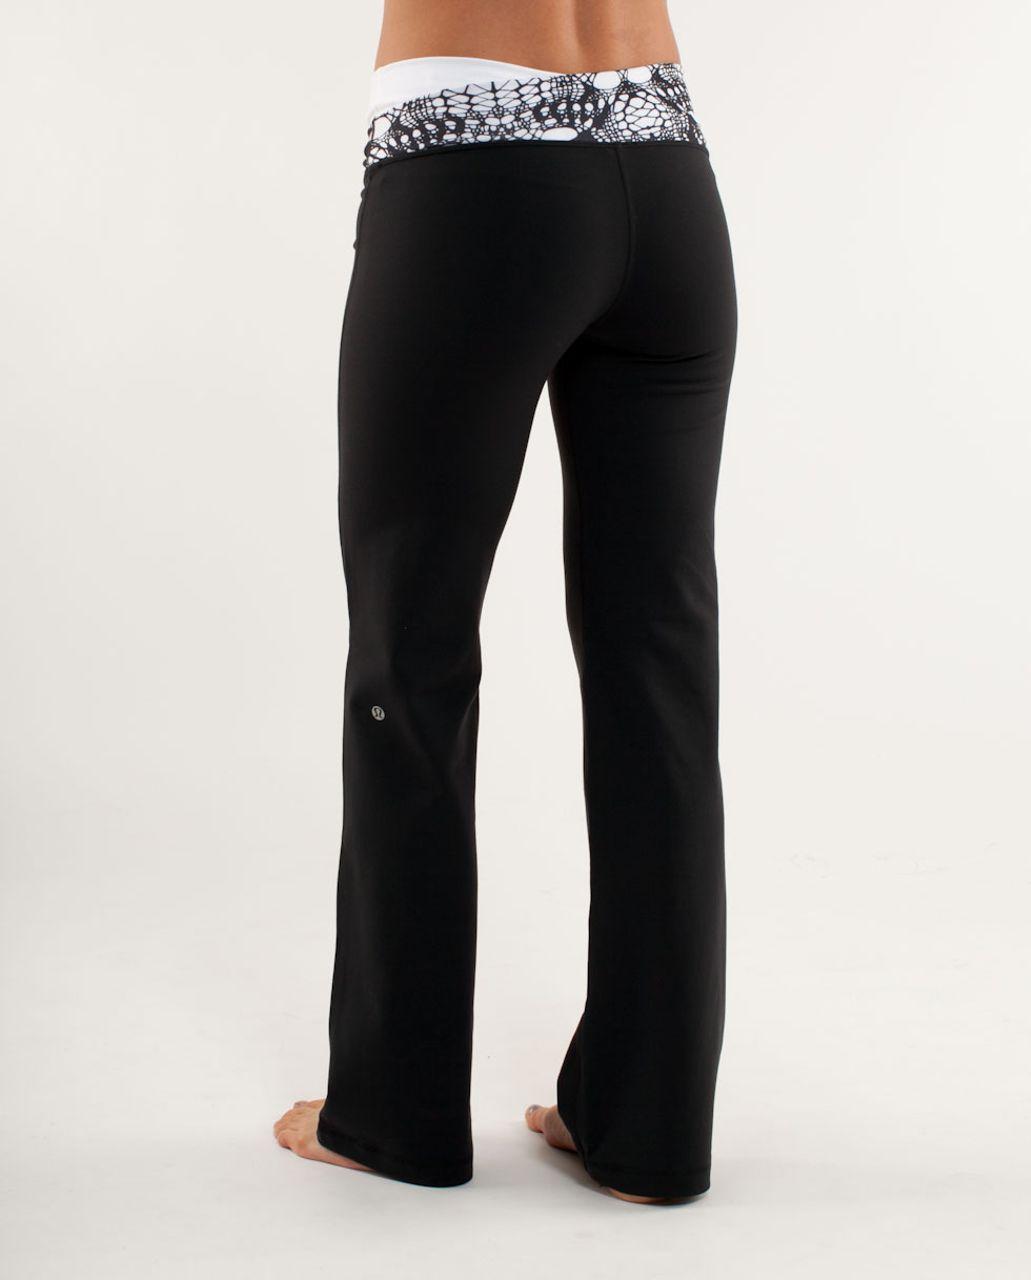 Lululemon Astro Pant (Tall) - Black /  Black Glacier Lace Embossed /  White Black Glacier Lace